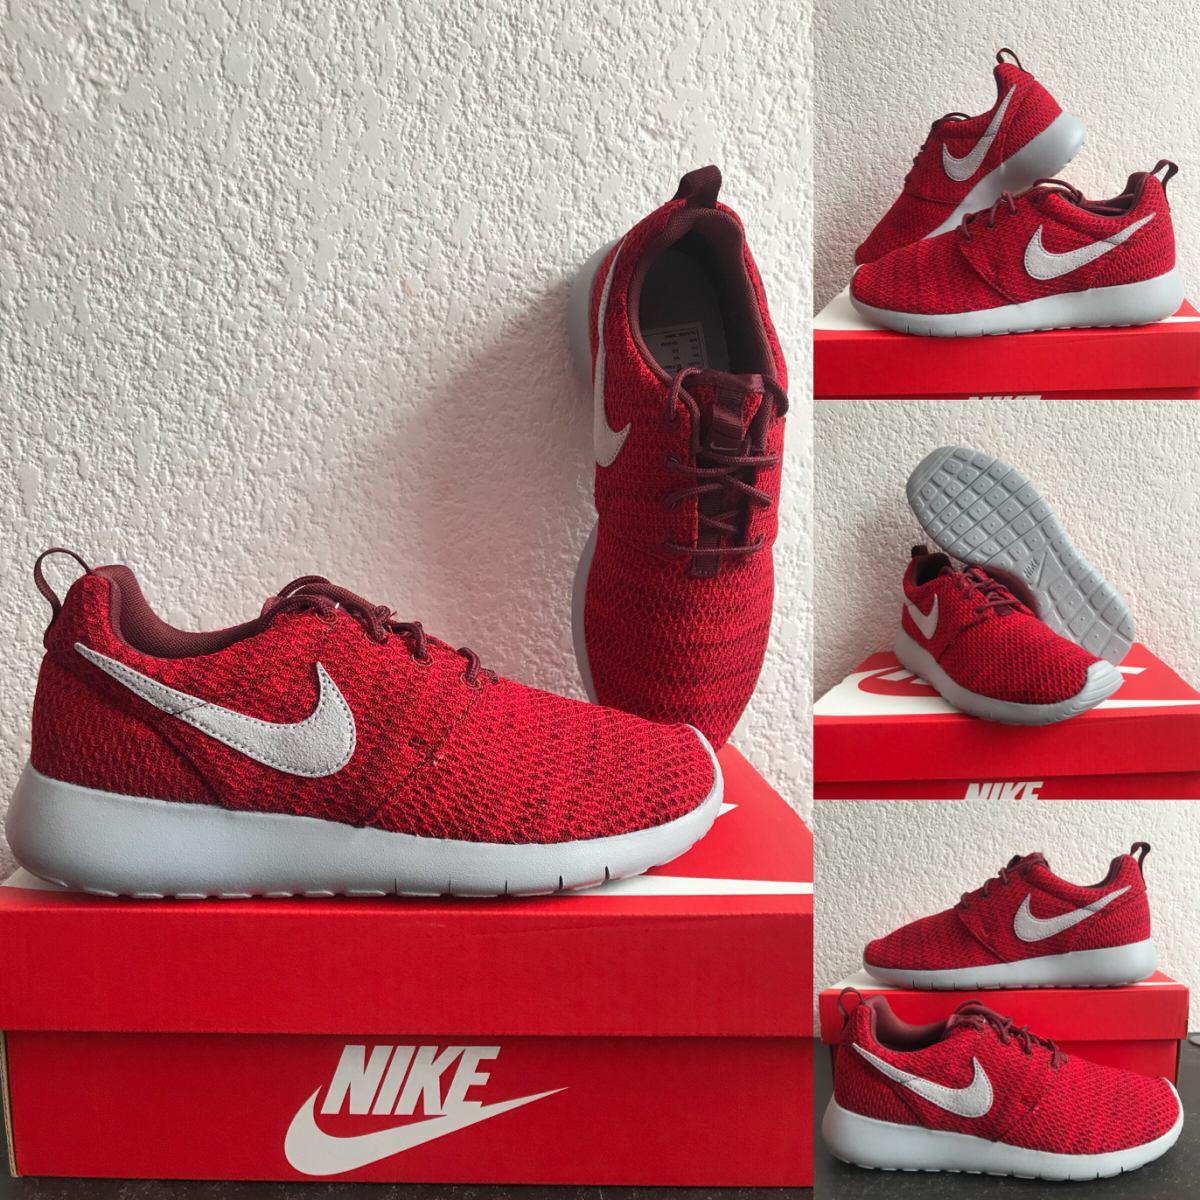 Tenis Roshe W RojoTalla 4Originales Nike One 3Rq54AjL